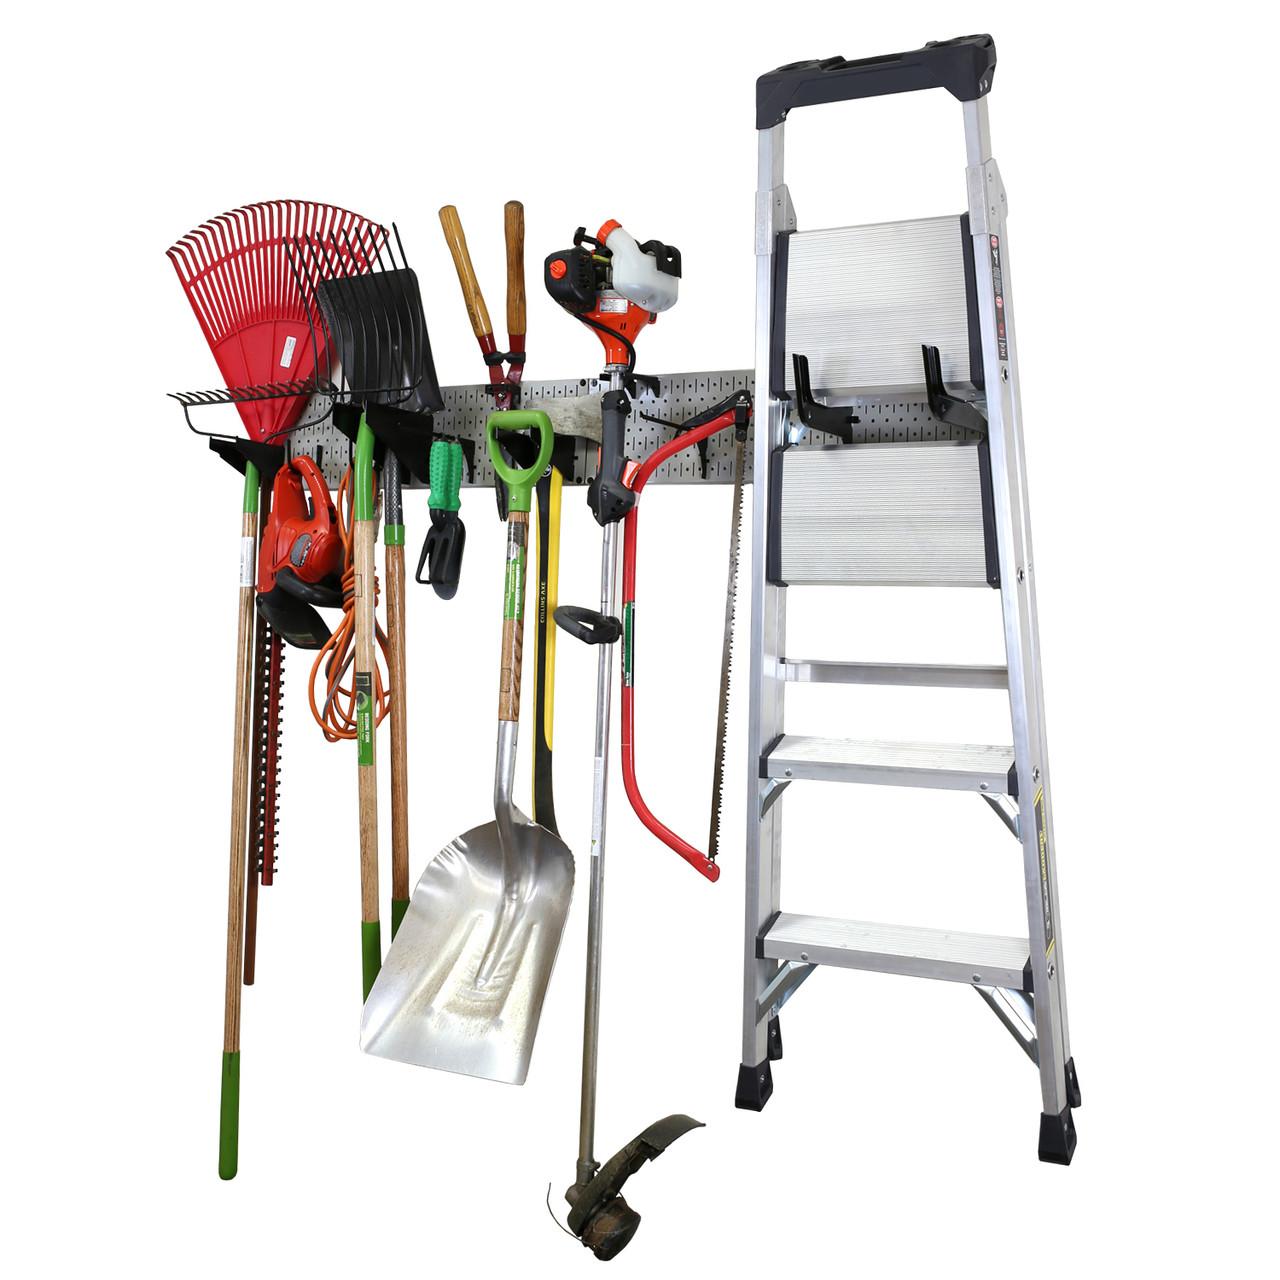 Garage Storage Lawn Garden Tool Organizer Rack Wall Control